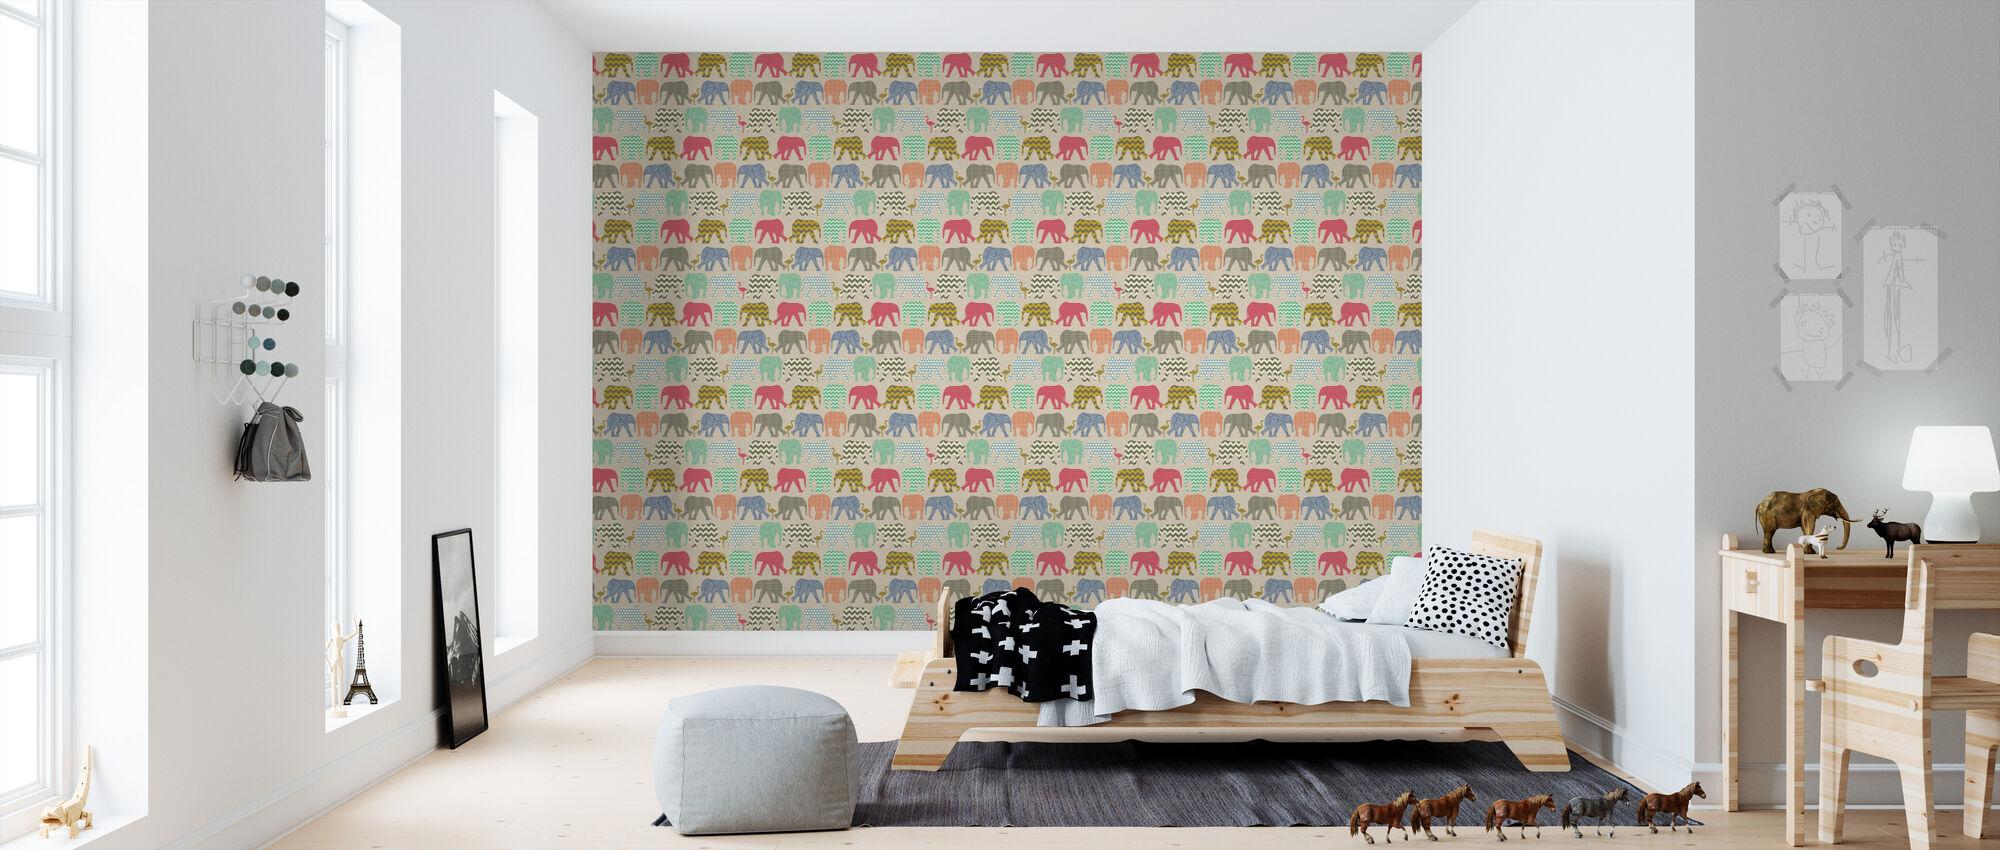 Baby Elephants and Flamingos 2 - Wallpaper - Kids Room